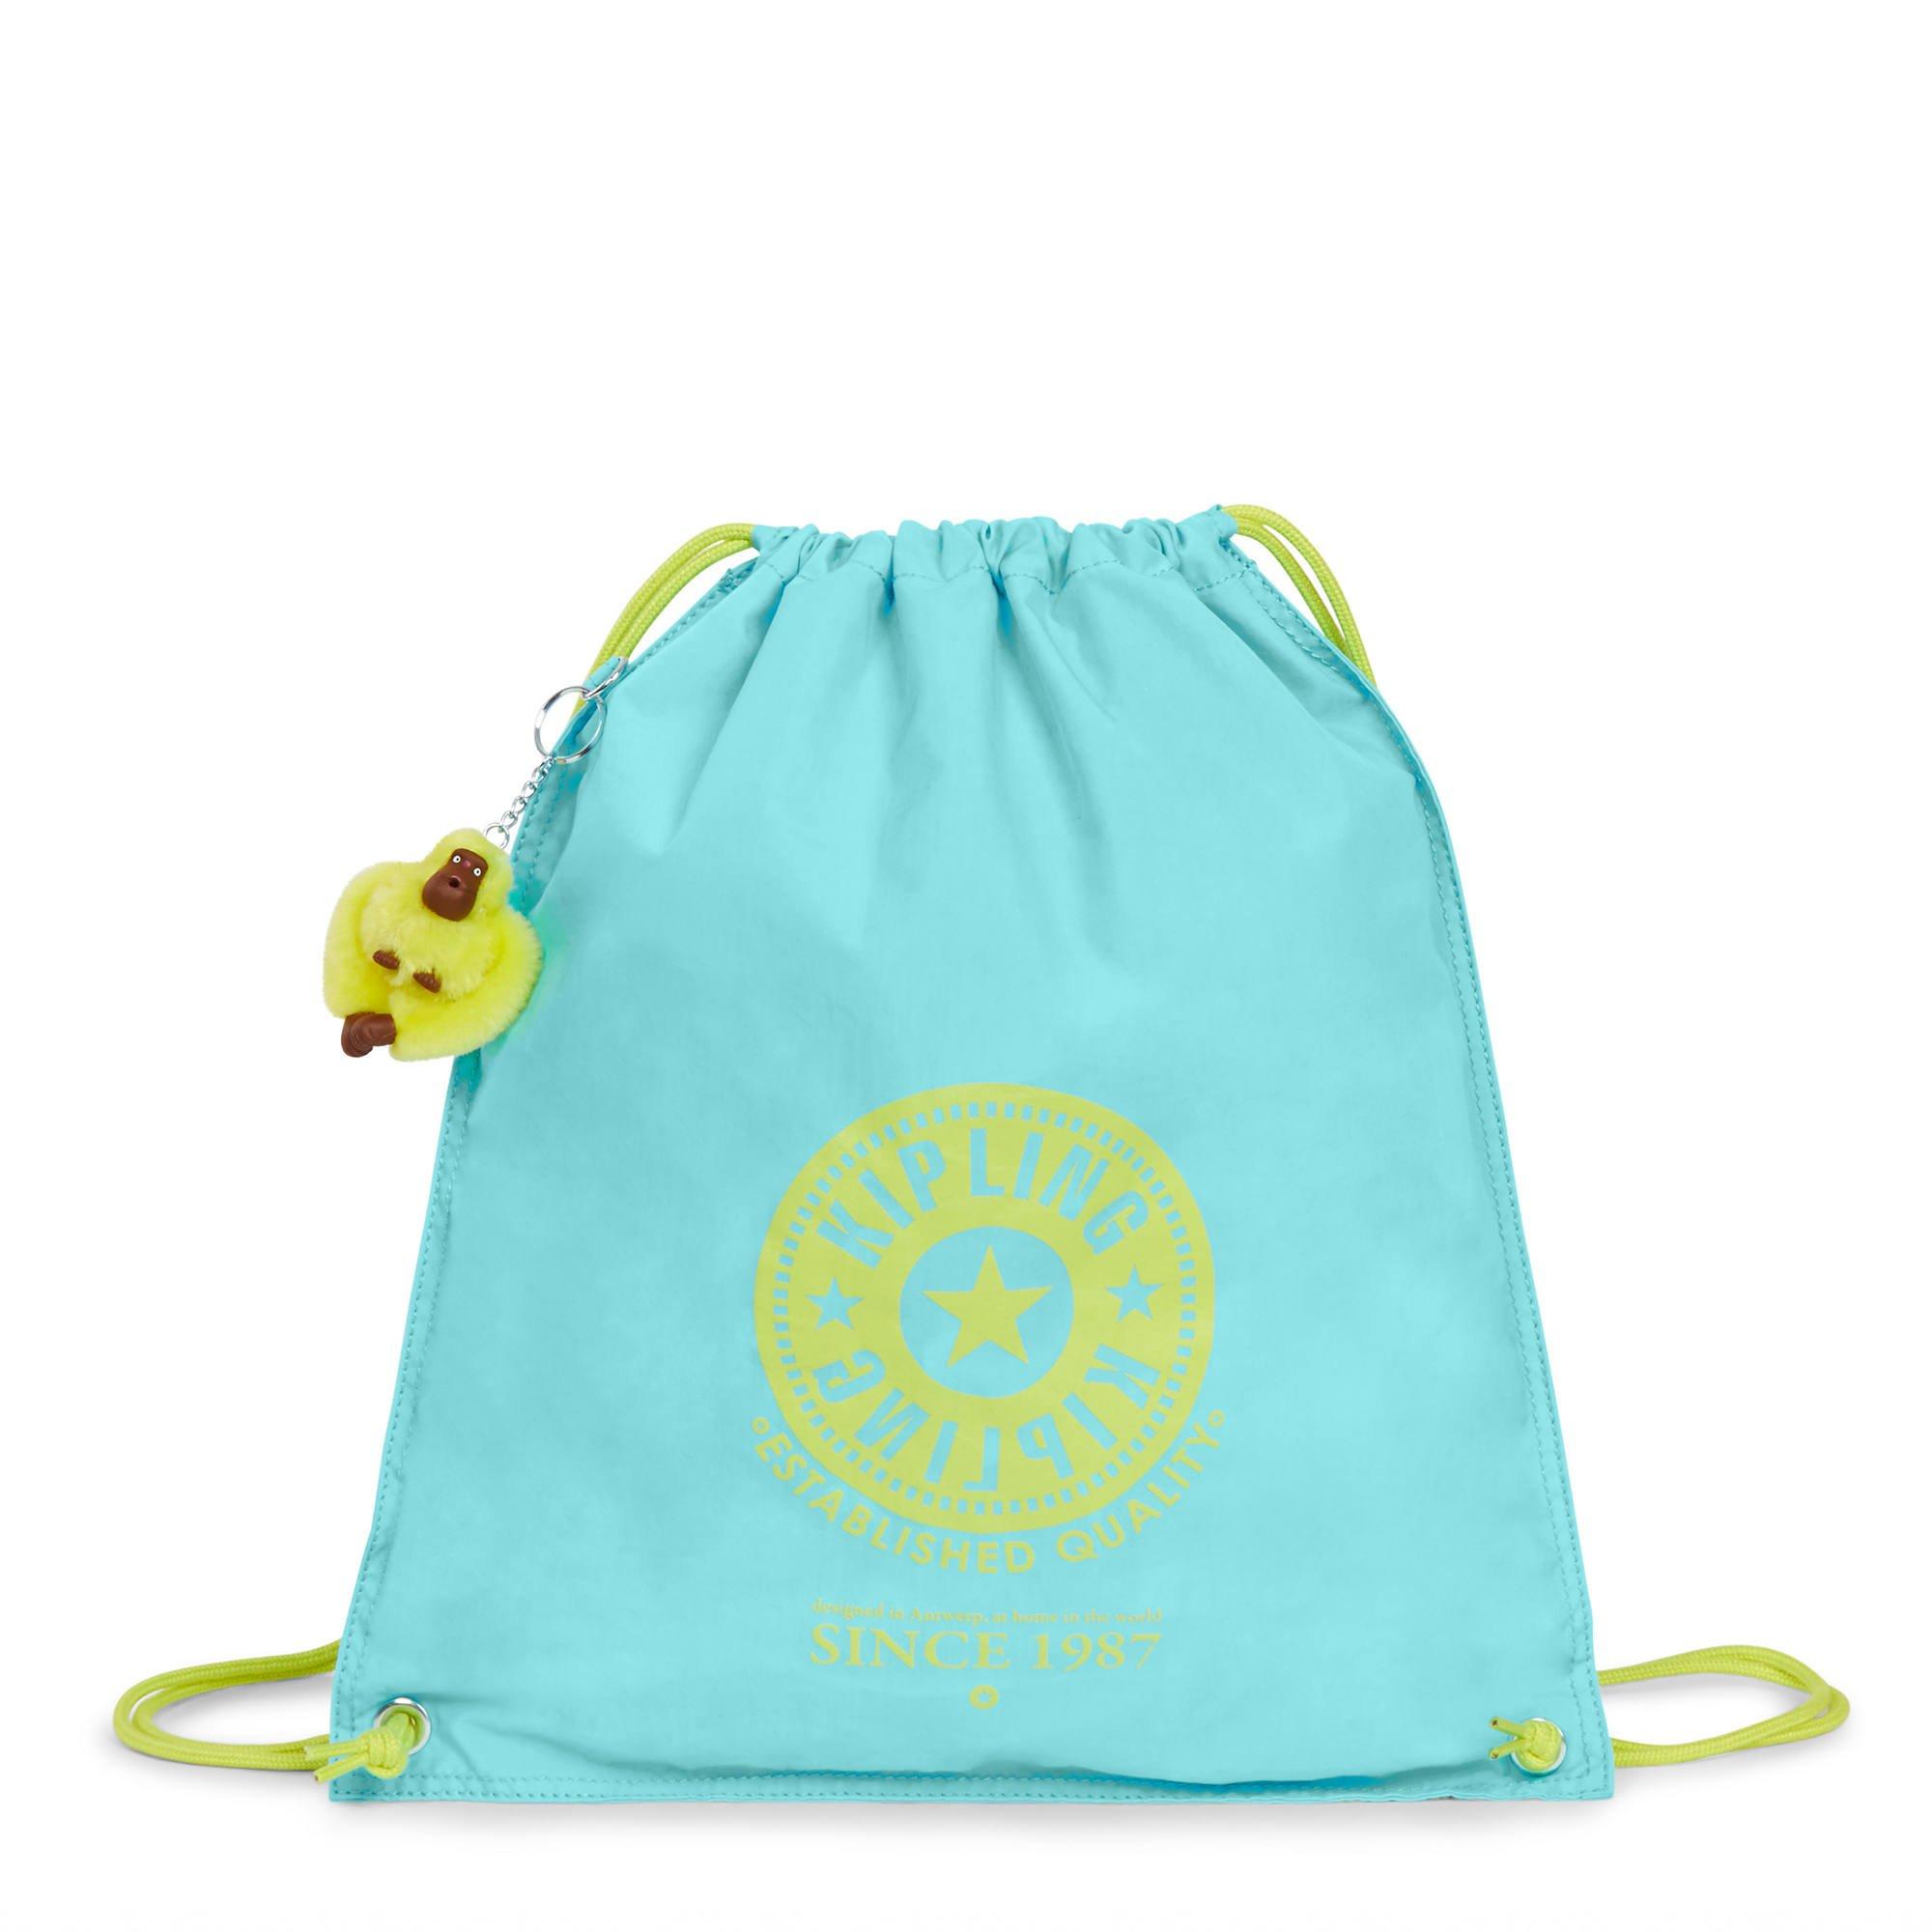 Kipling Women's Emjay Drawstring Backpack One Size Blue Splash